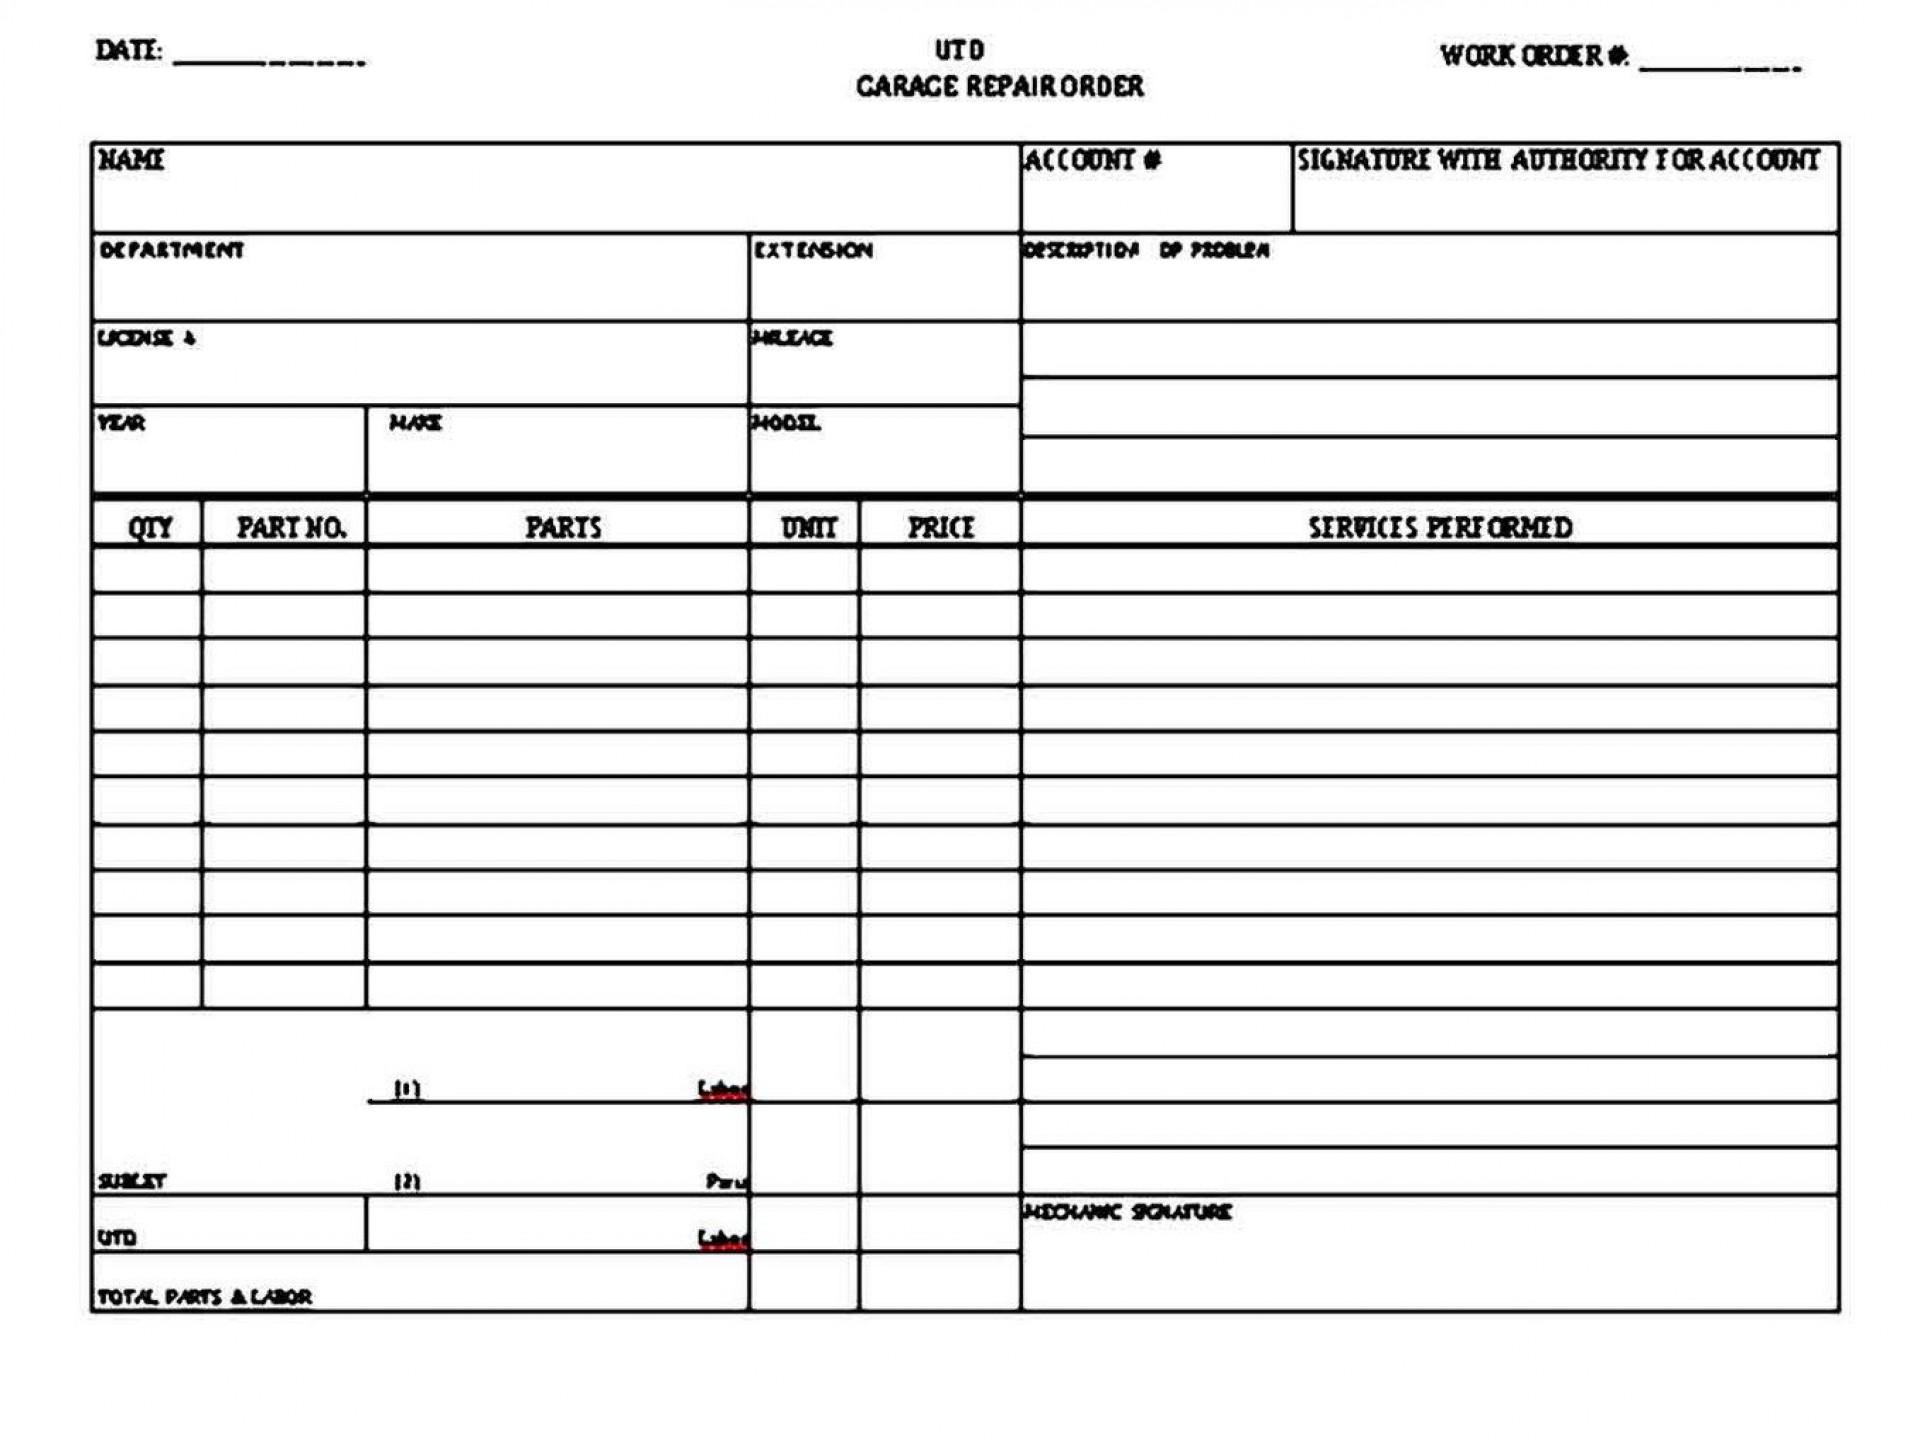 008 Imposing Auto Repair Invoice Template Free High Resolution  Excel Printable Pdf1920